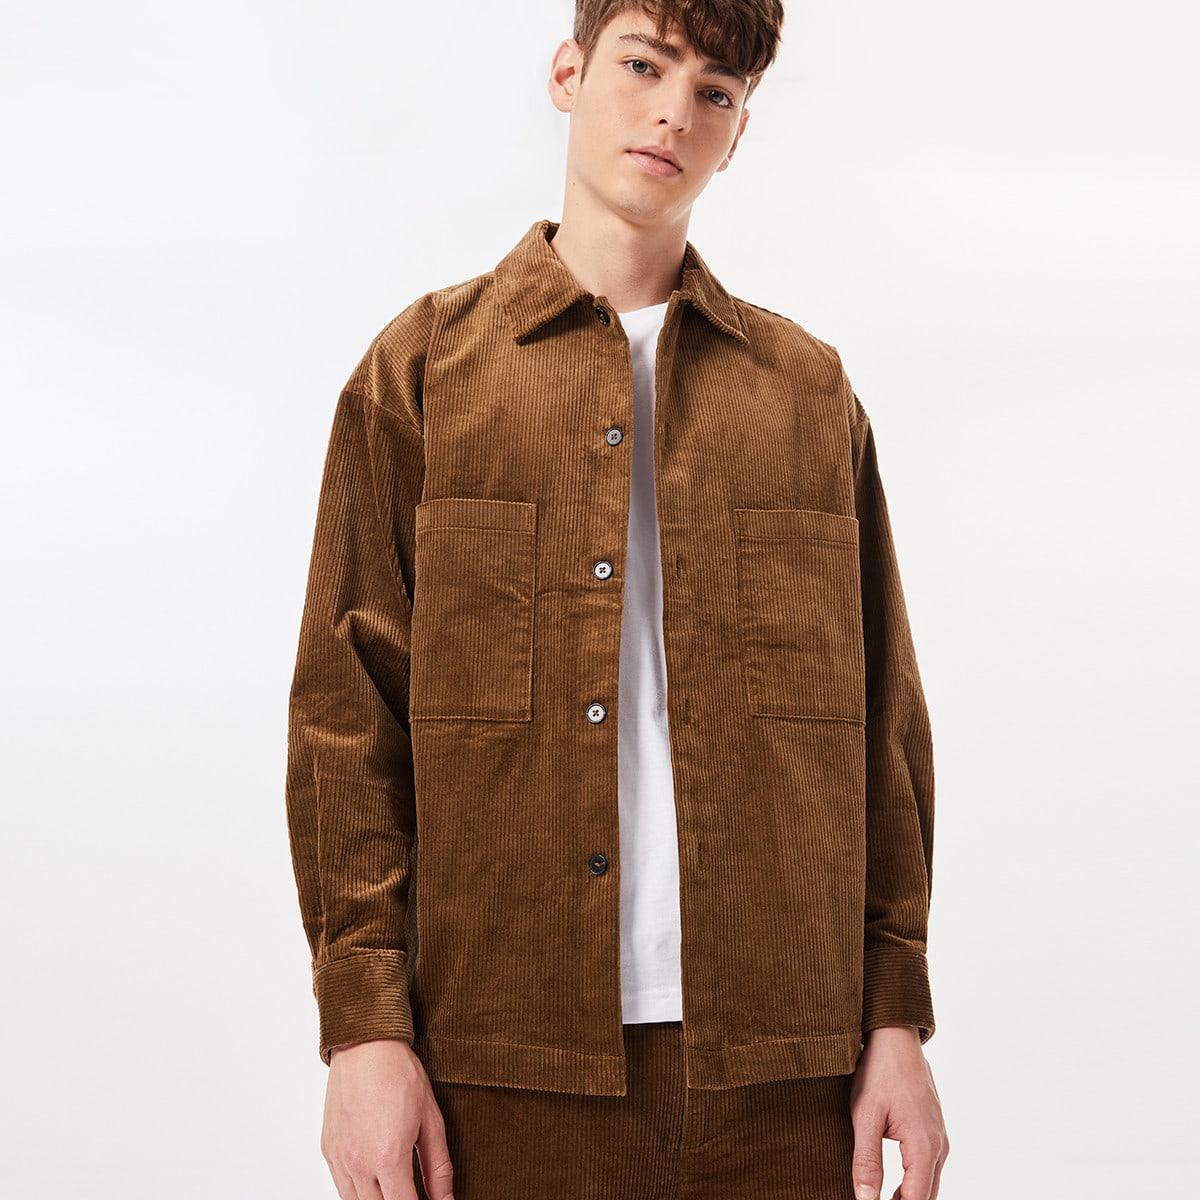 Мужская вельветовая рубашка с карманом SheIn sm2107023222344266